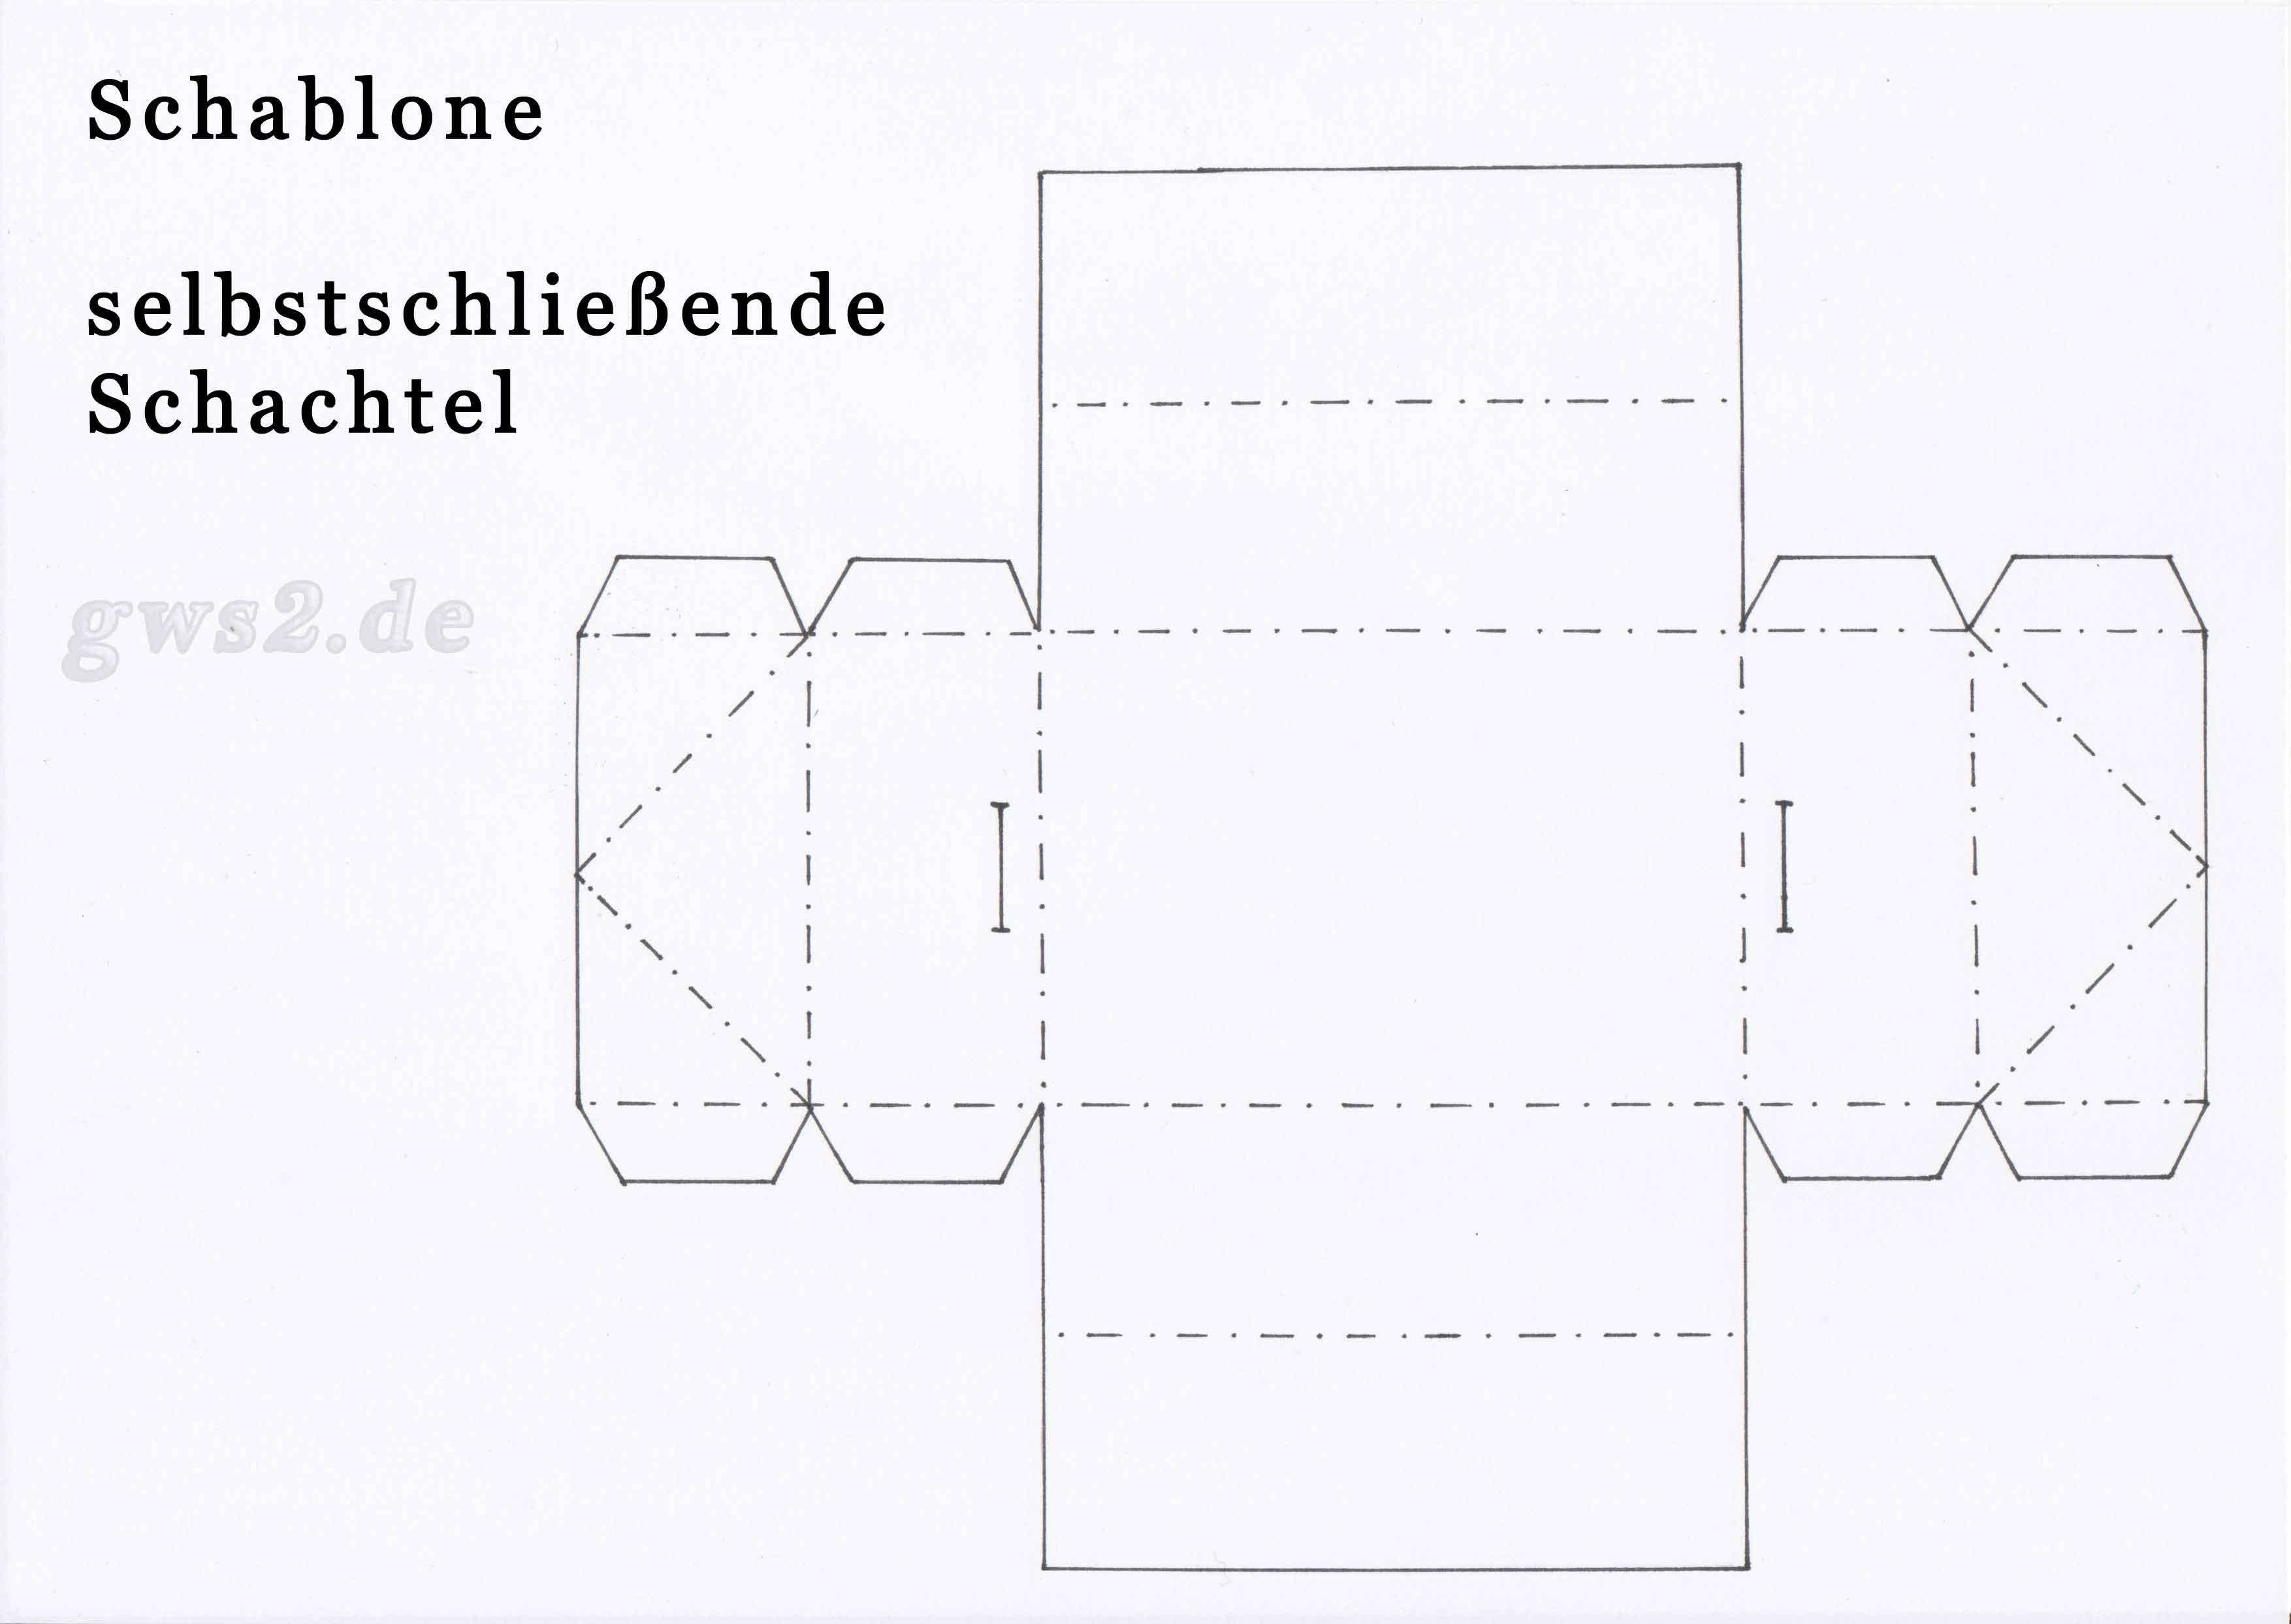 geschenkverpackung selbstschlie ende schachtel. Black Bedroom Furniture Sets. Home Design Ideas